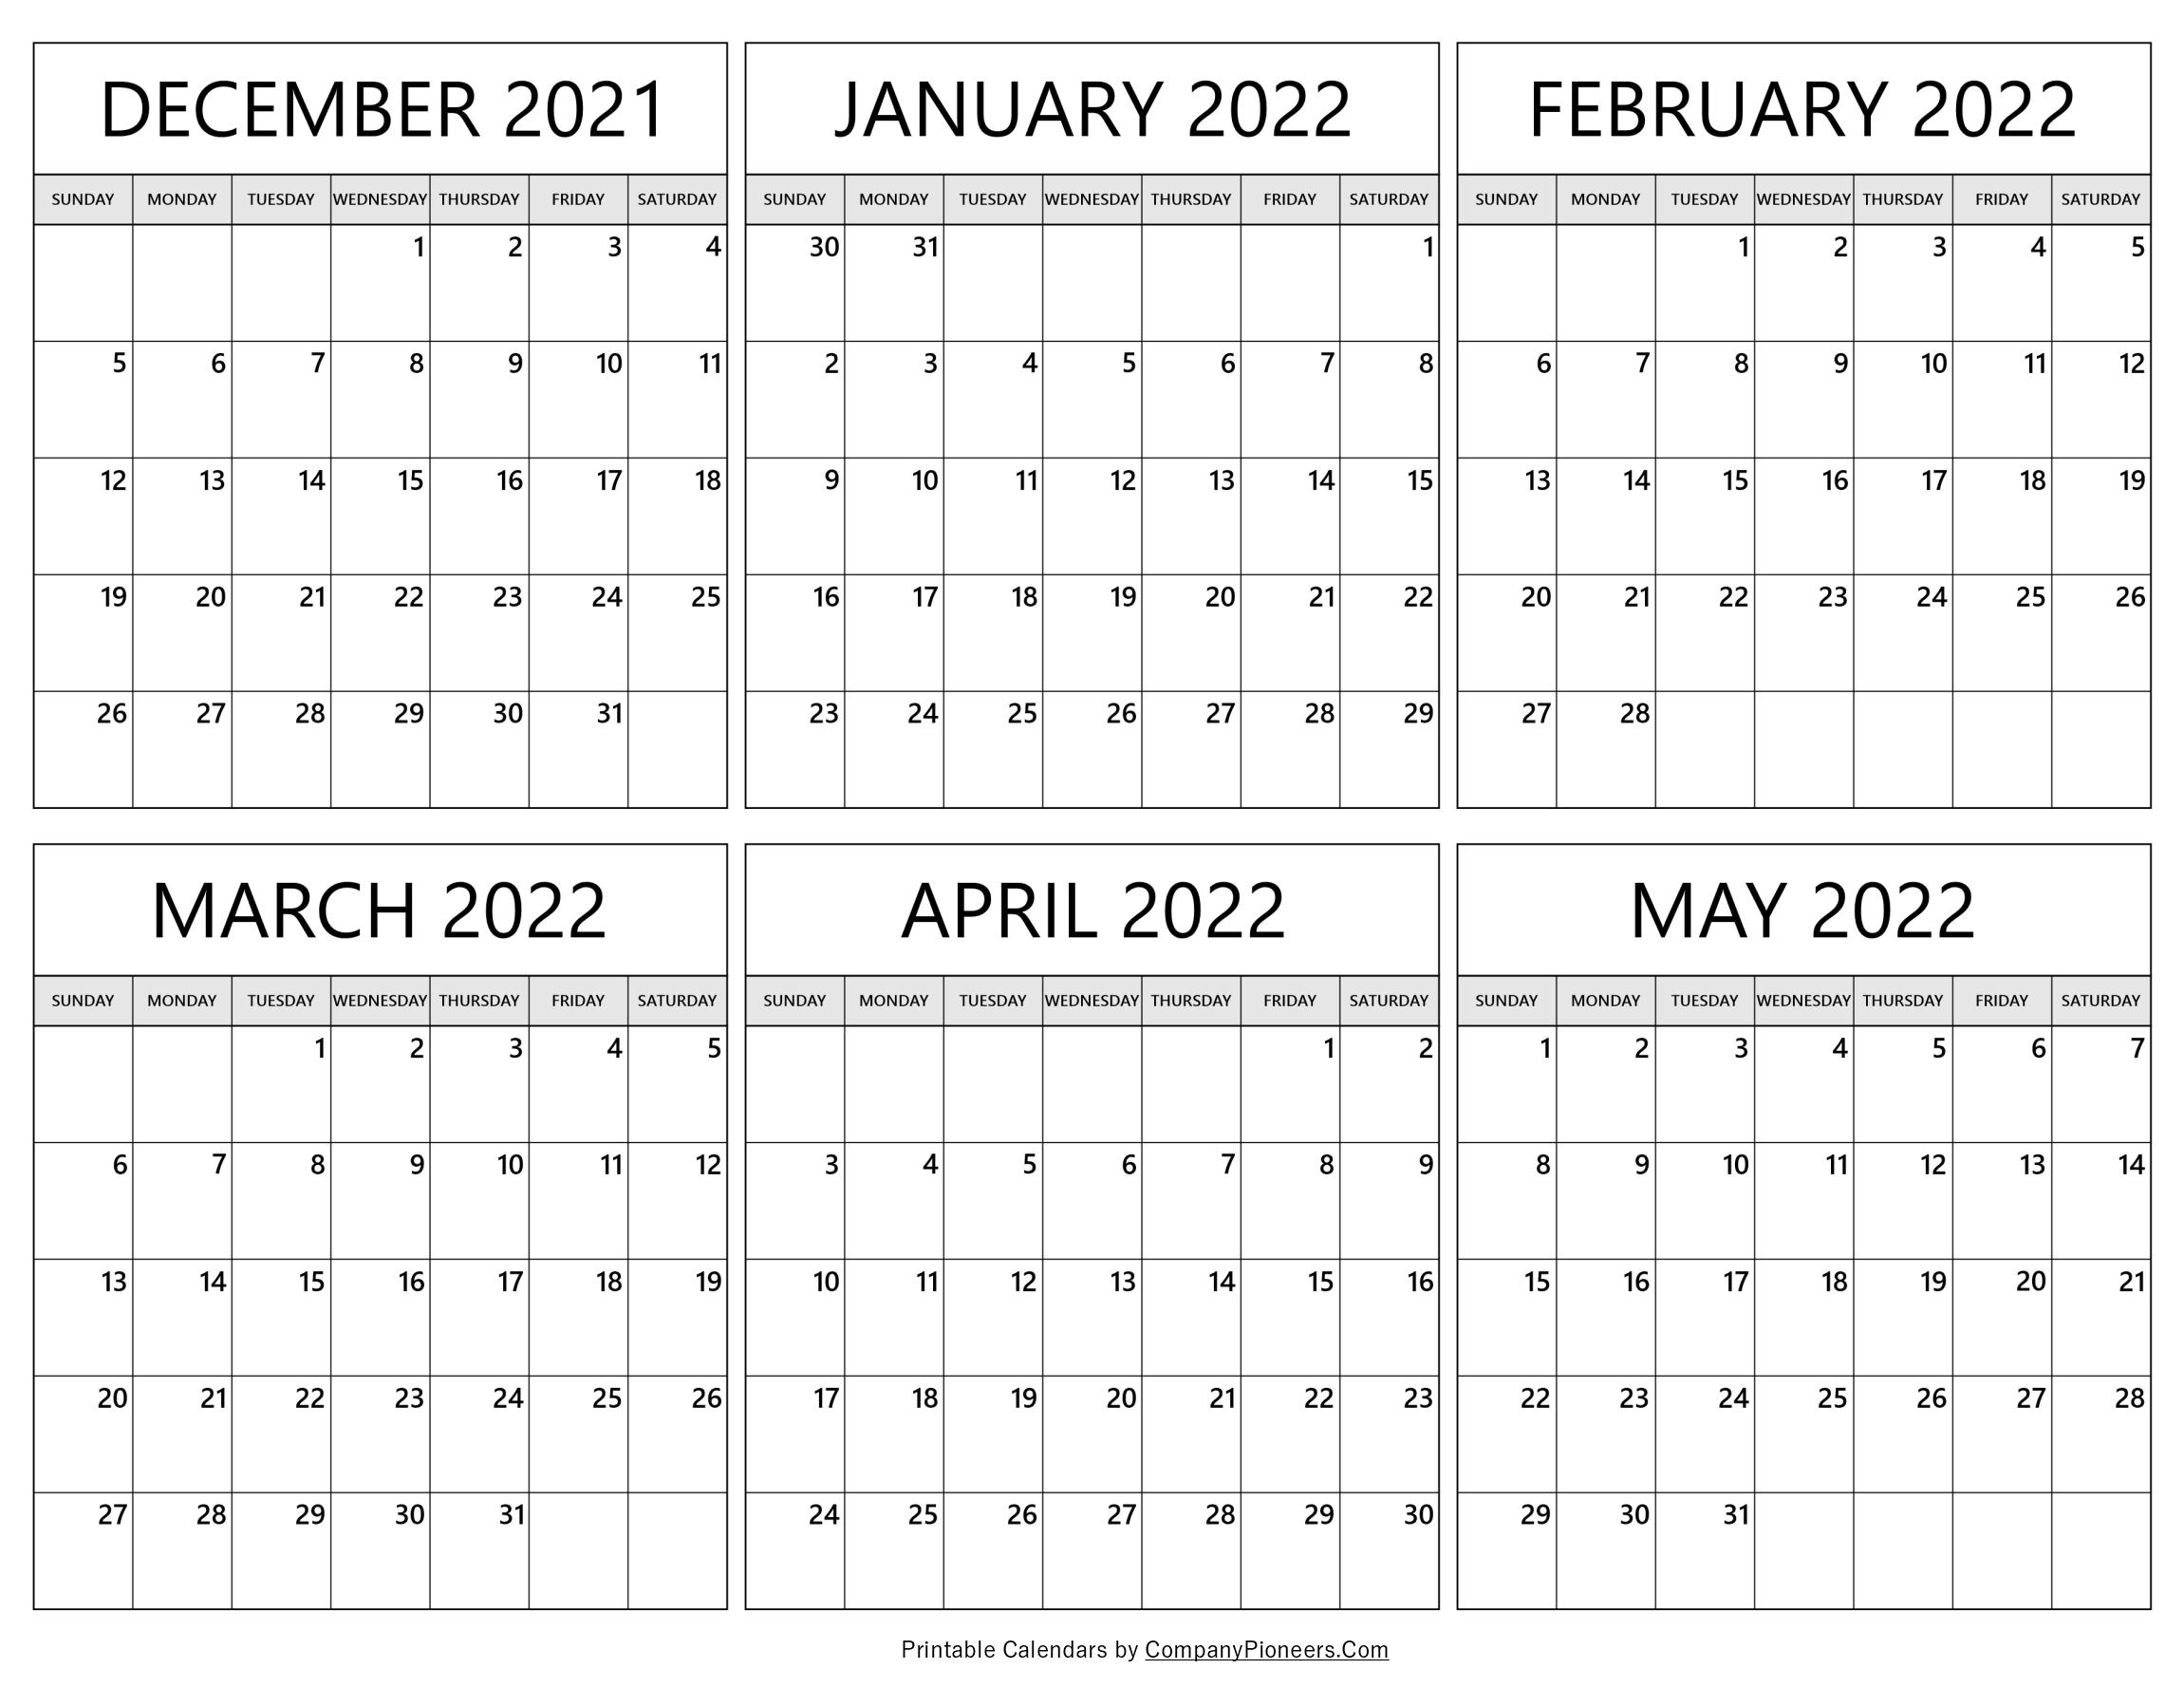 December 2021 to May 2022 Calendar